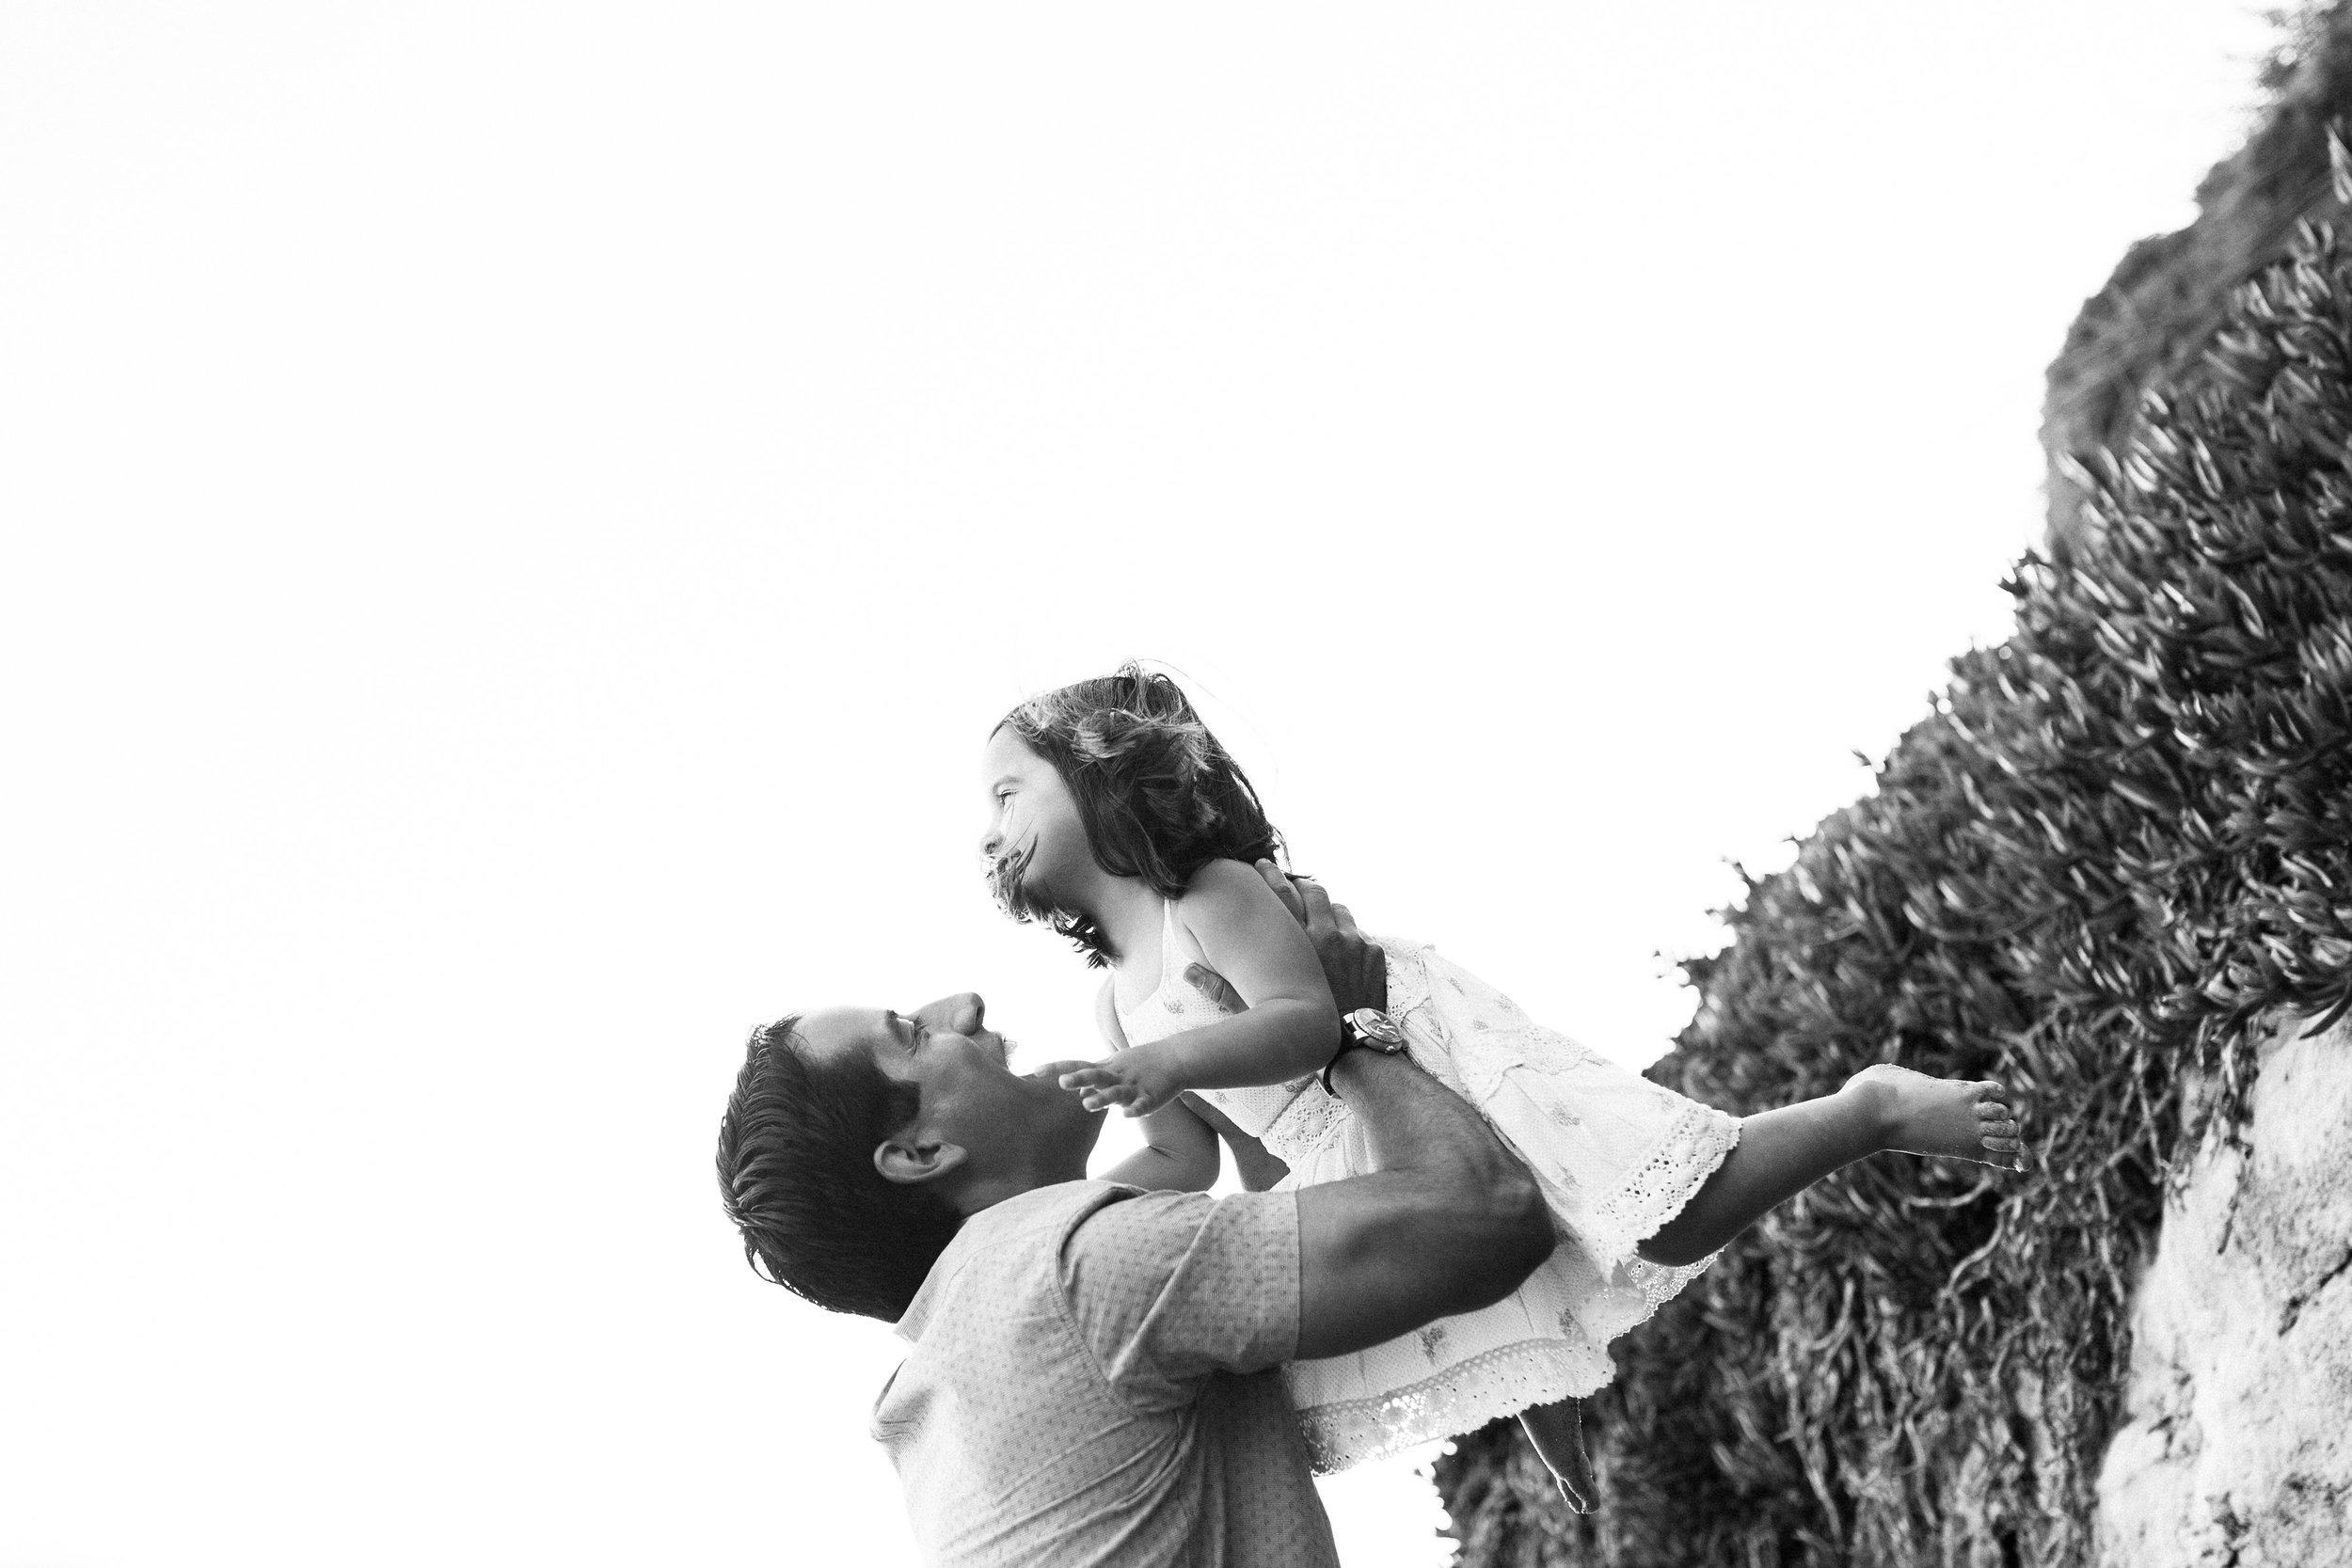 ruiz-family_laguna_los-angeles-beach-family-photography-28.jpg